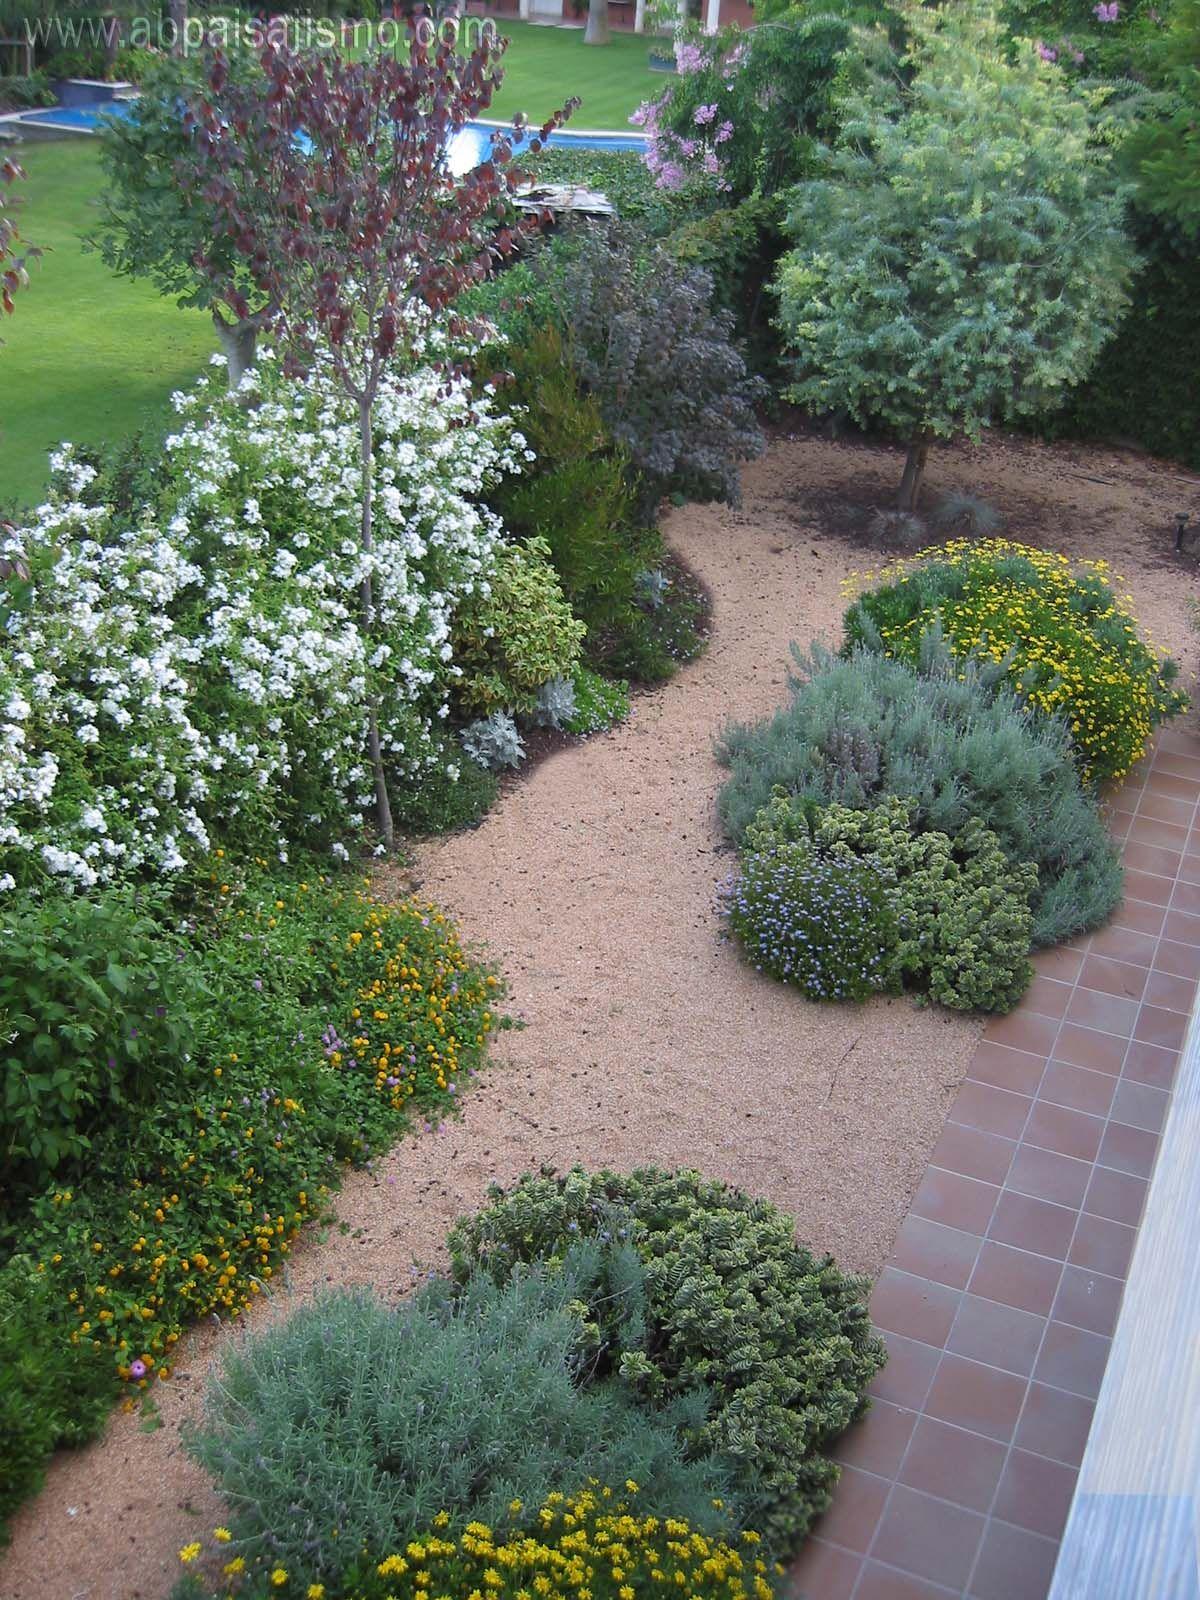 Jard n de grava sustentable euryops pectinatus plumbago - Gravas para jardin ...